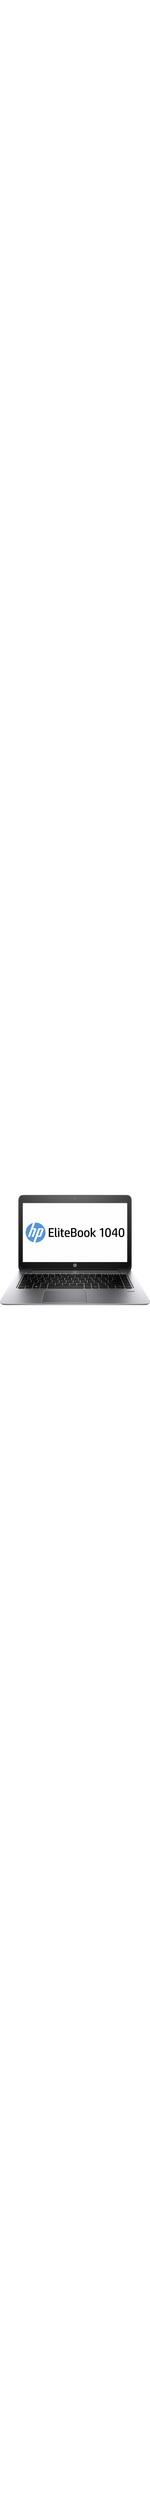 HP EliteBook Folio 1040 G1 35.6 cm 14And#34; LED Ultrabook - Intel Core i7 i7-4600U 2.10 GHz